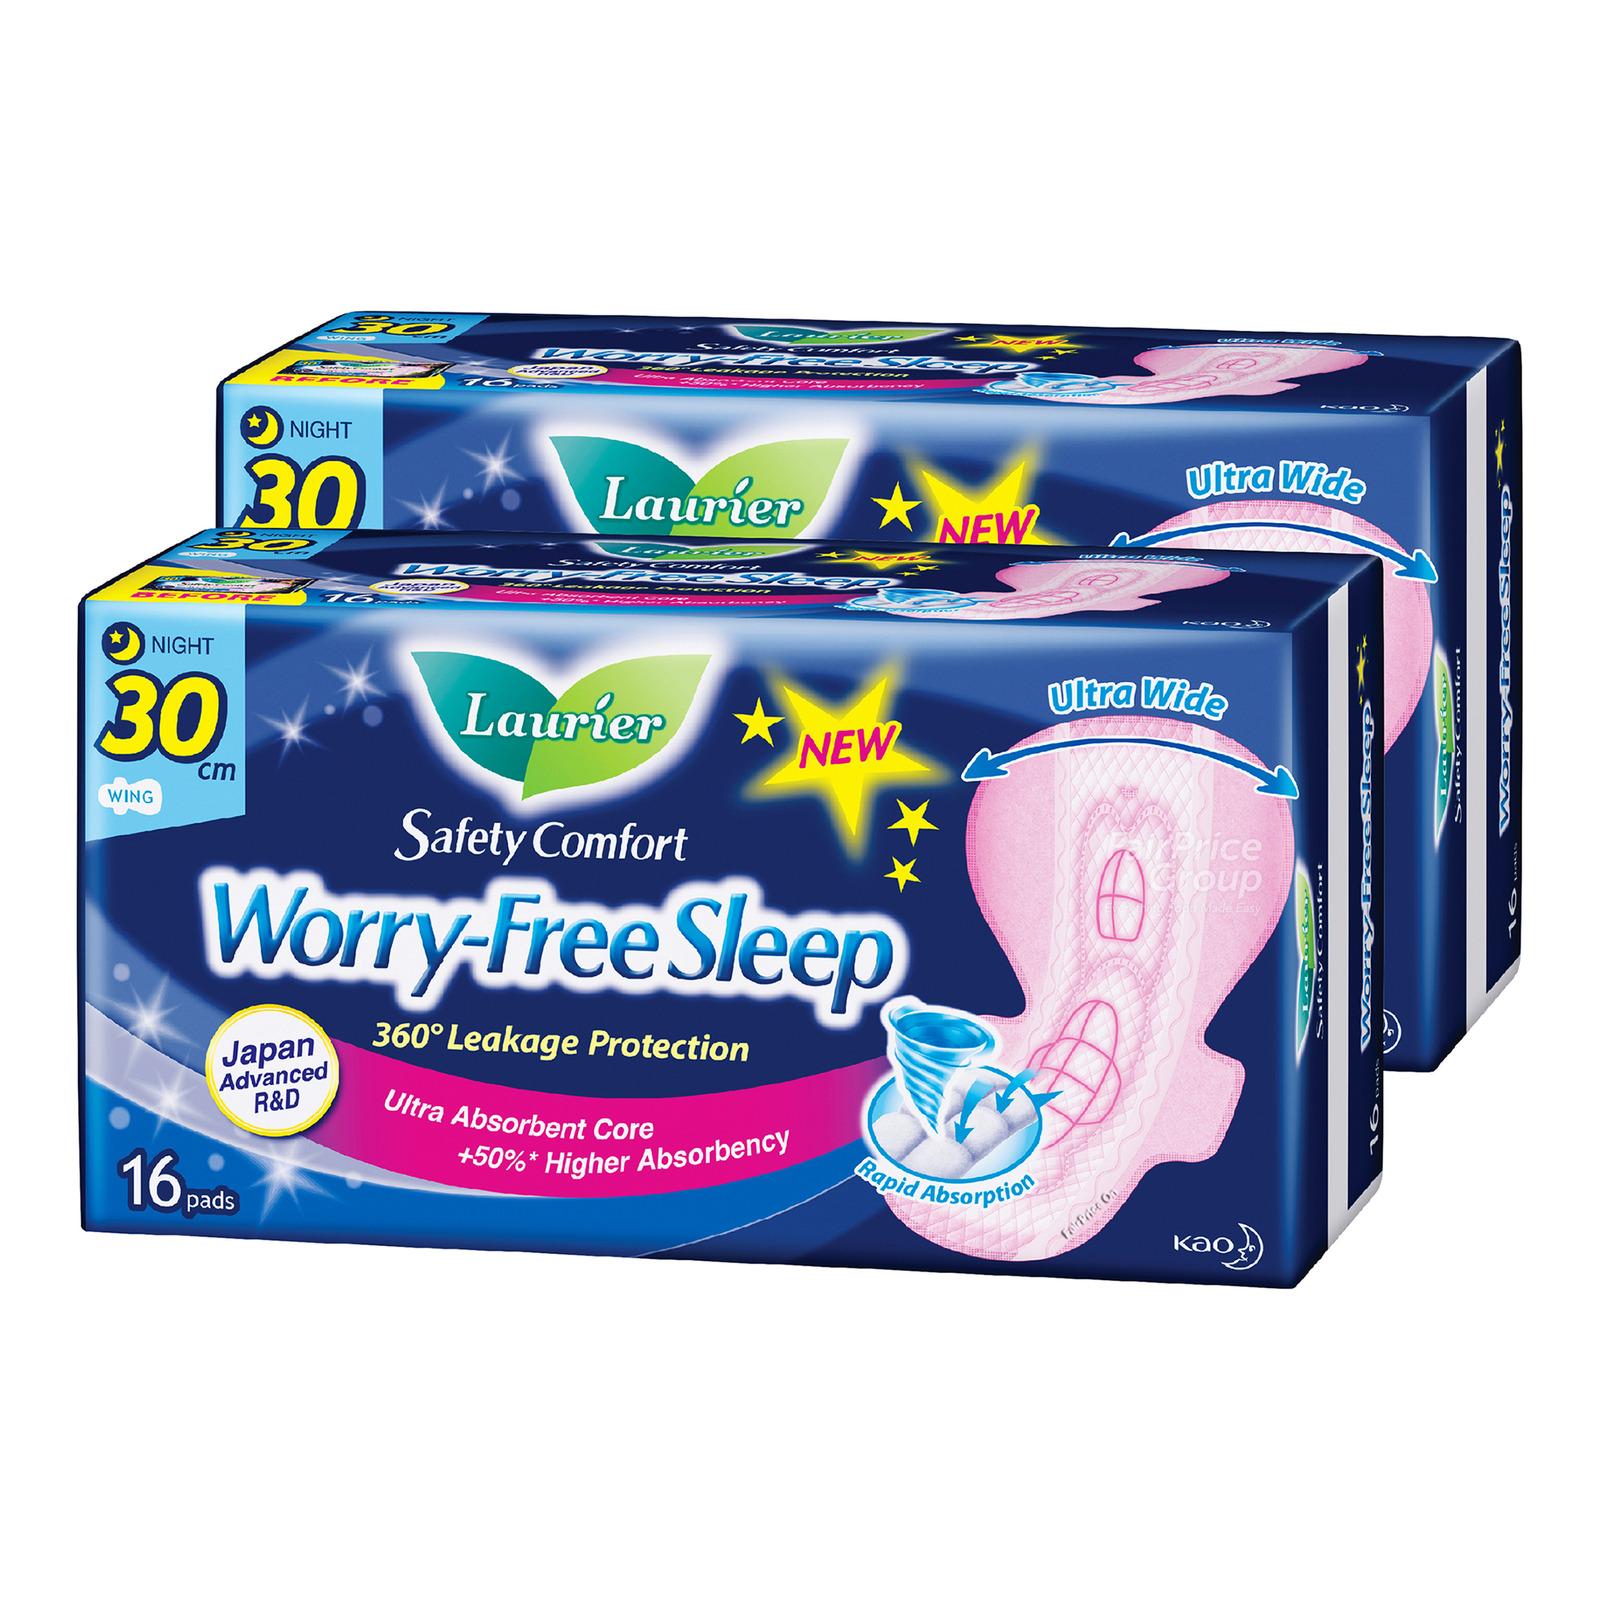 Laurier Worry-Free Sleep Night Pads - 30cm